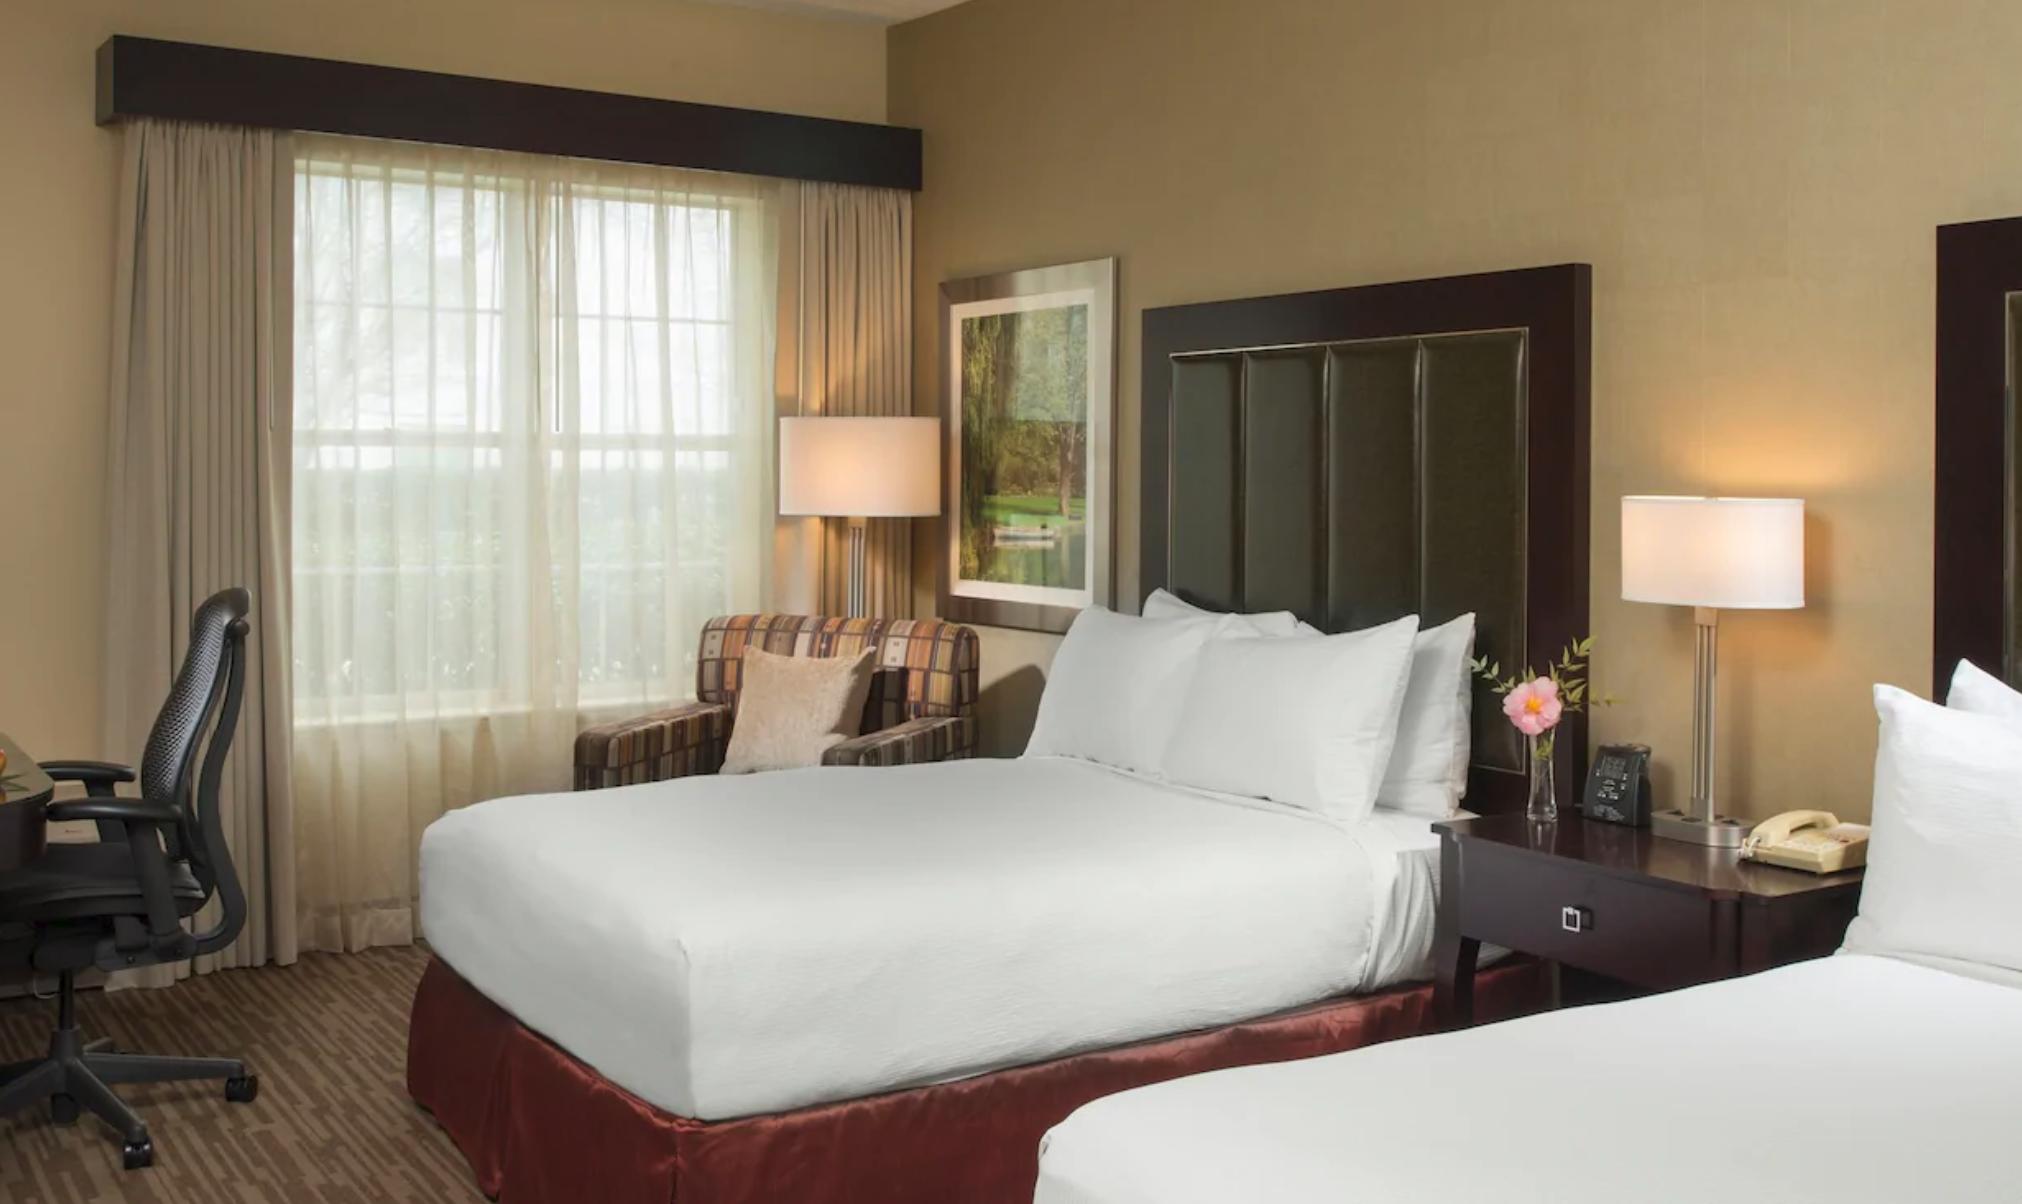 https://www.hotelsbyday.com/_data/default-hotel_image/4/20414/screenshot-2020-08-13-at-9-56-29-am.png